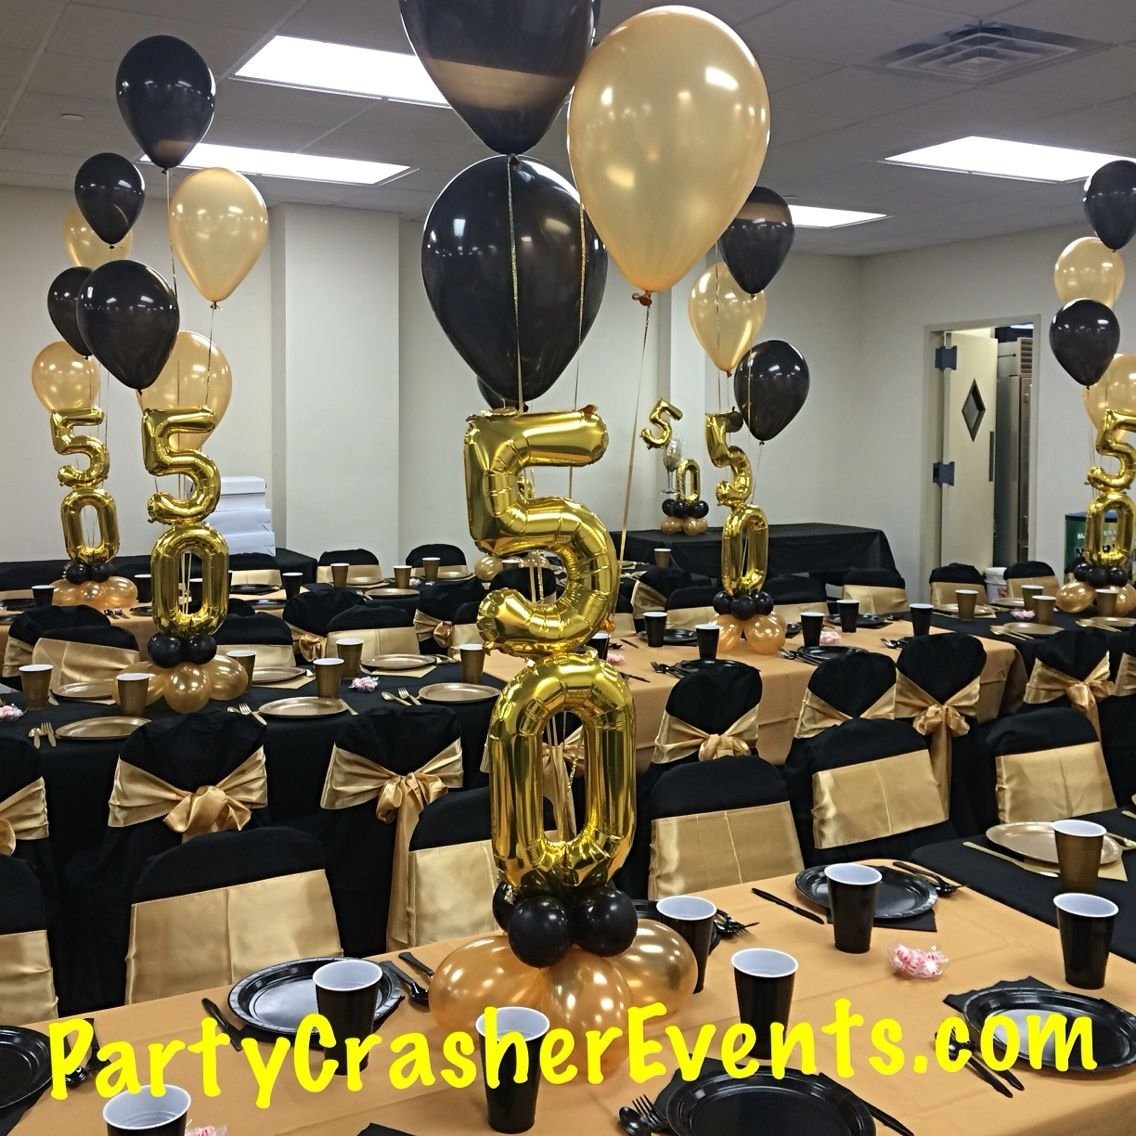 10 Stylish Party Ideas For 50Th Birthday https www birthdays durban 30 year old birthday party ideas 8